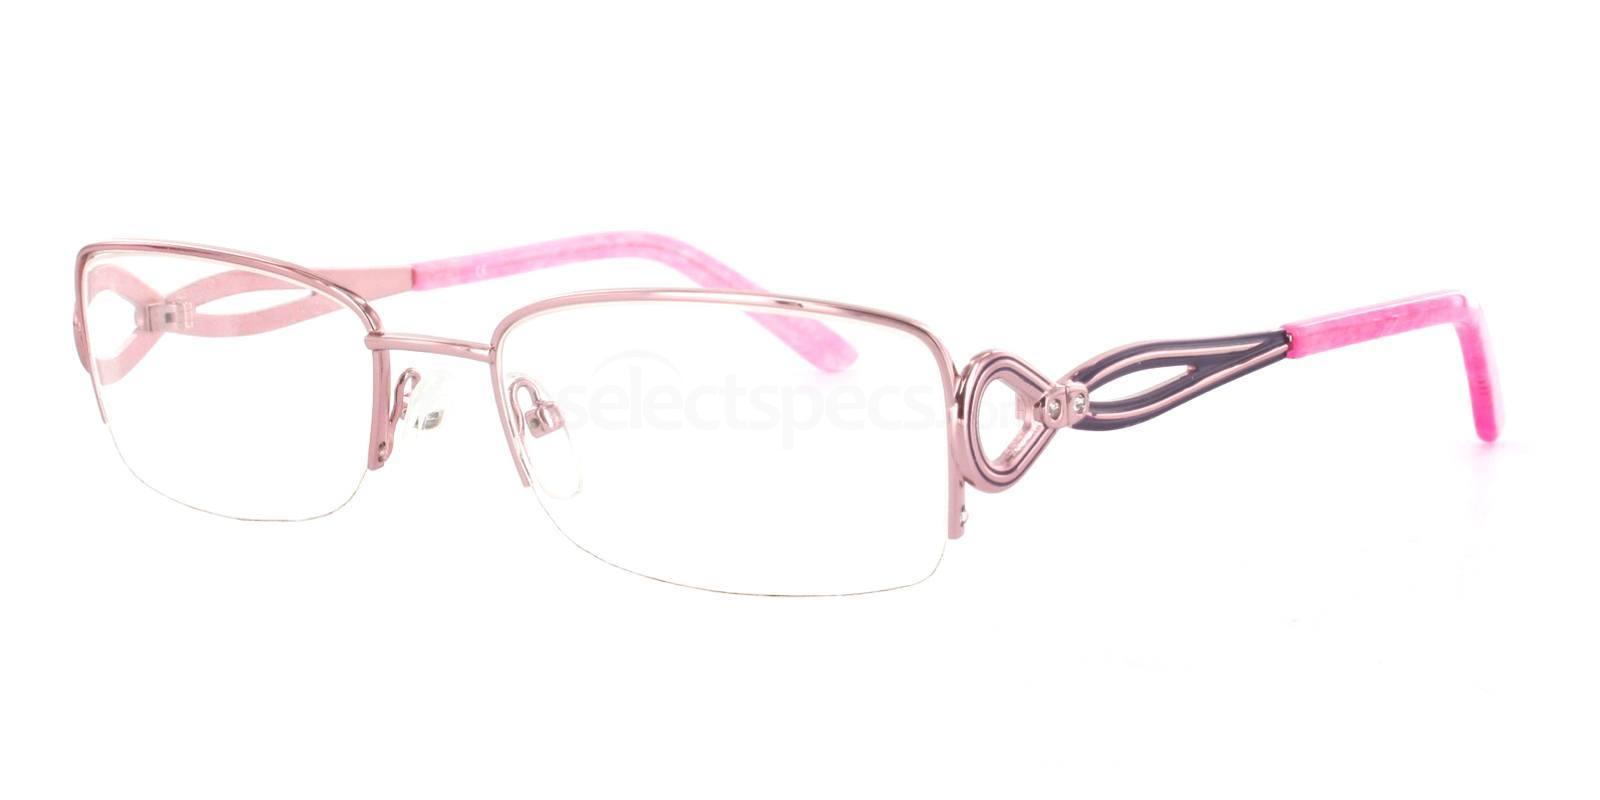 C4 Y25948 Glasses, SelectSpecs